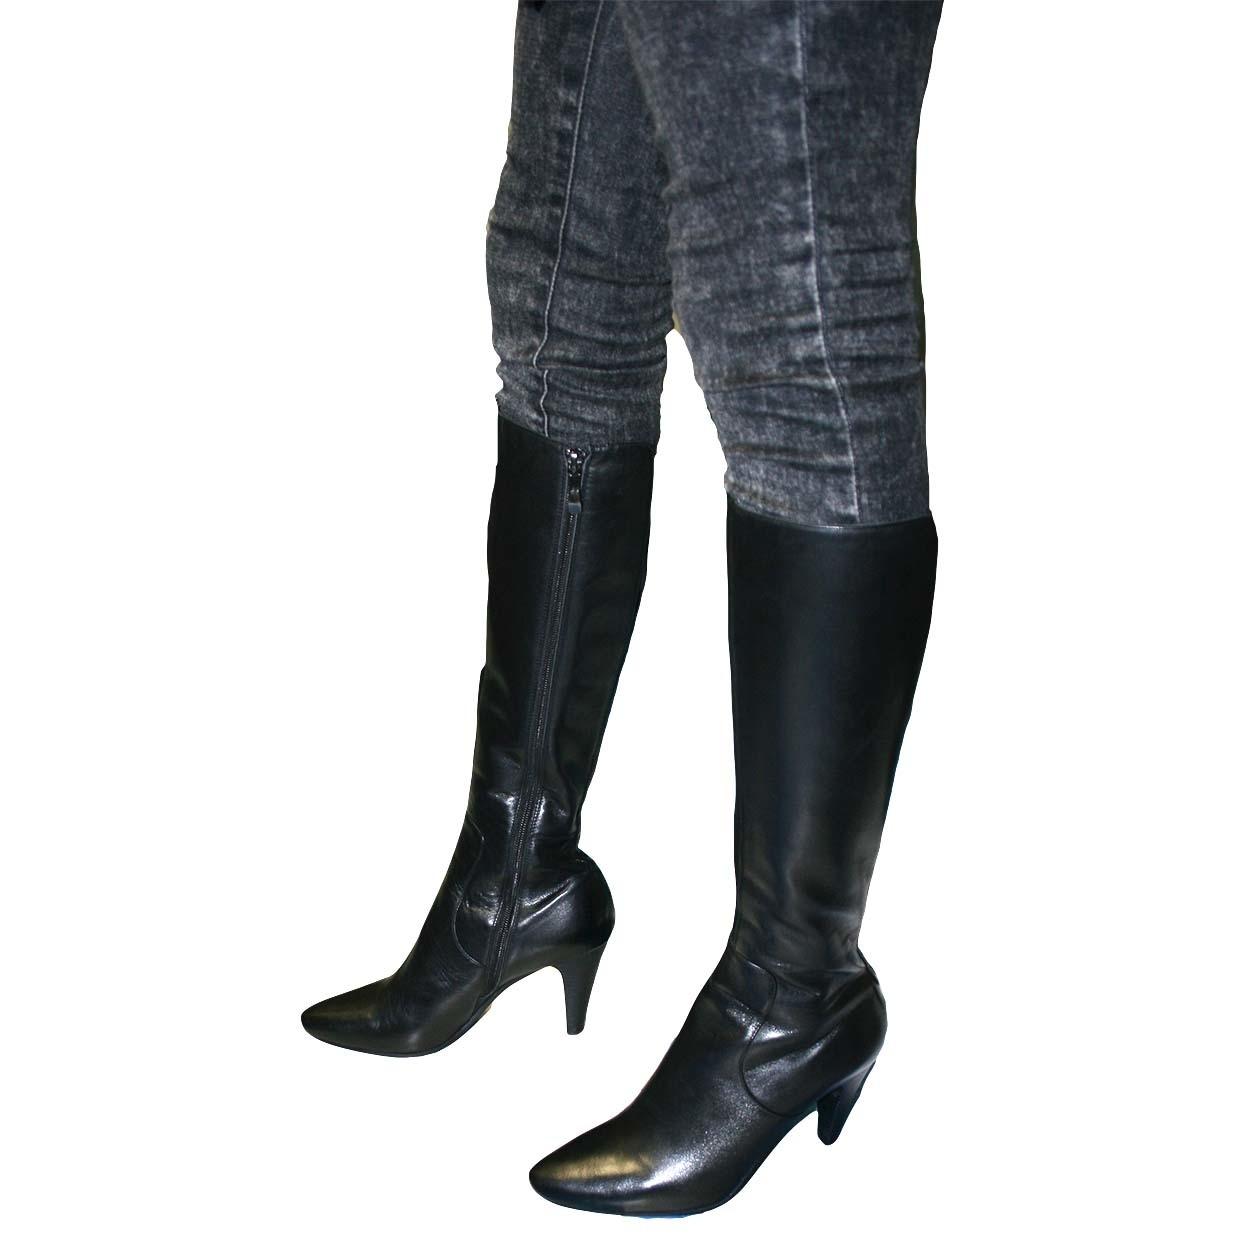 womens leather boots solemani womenu0027s paradise black leather boots narrow calf KNVGOCB